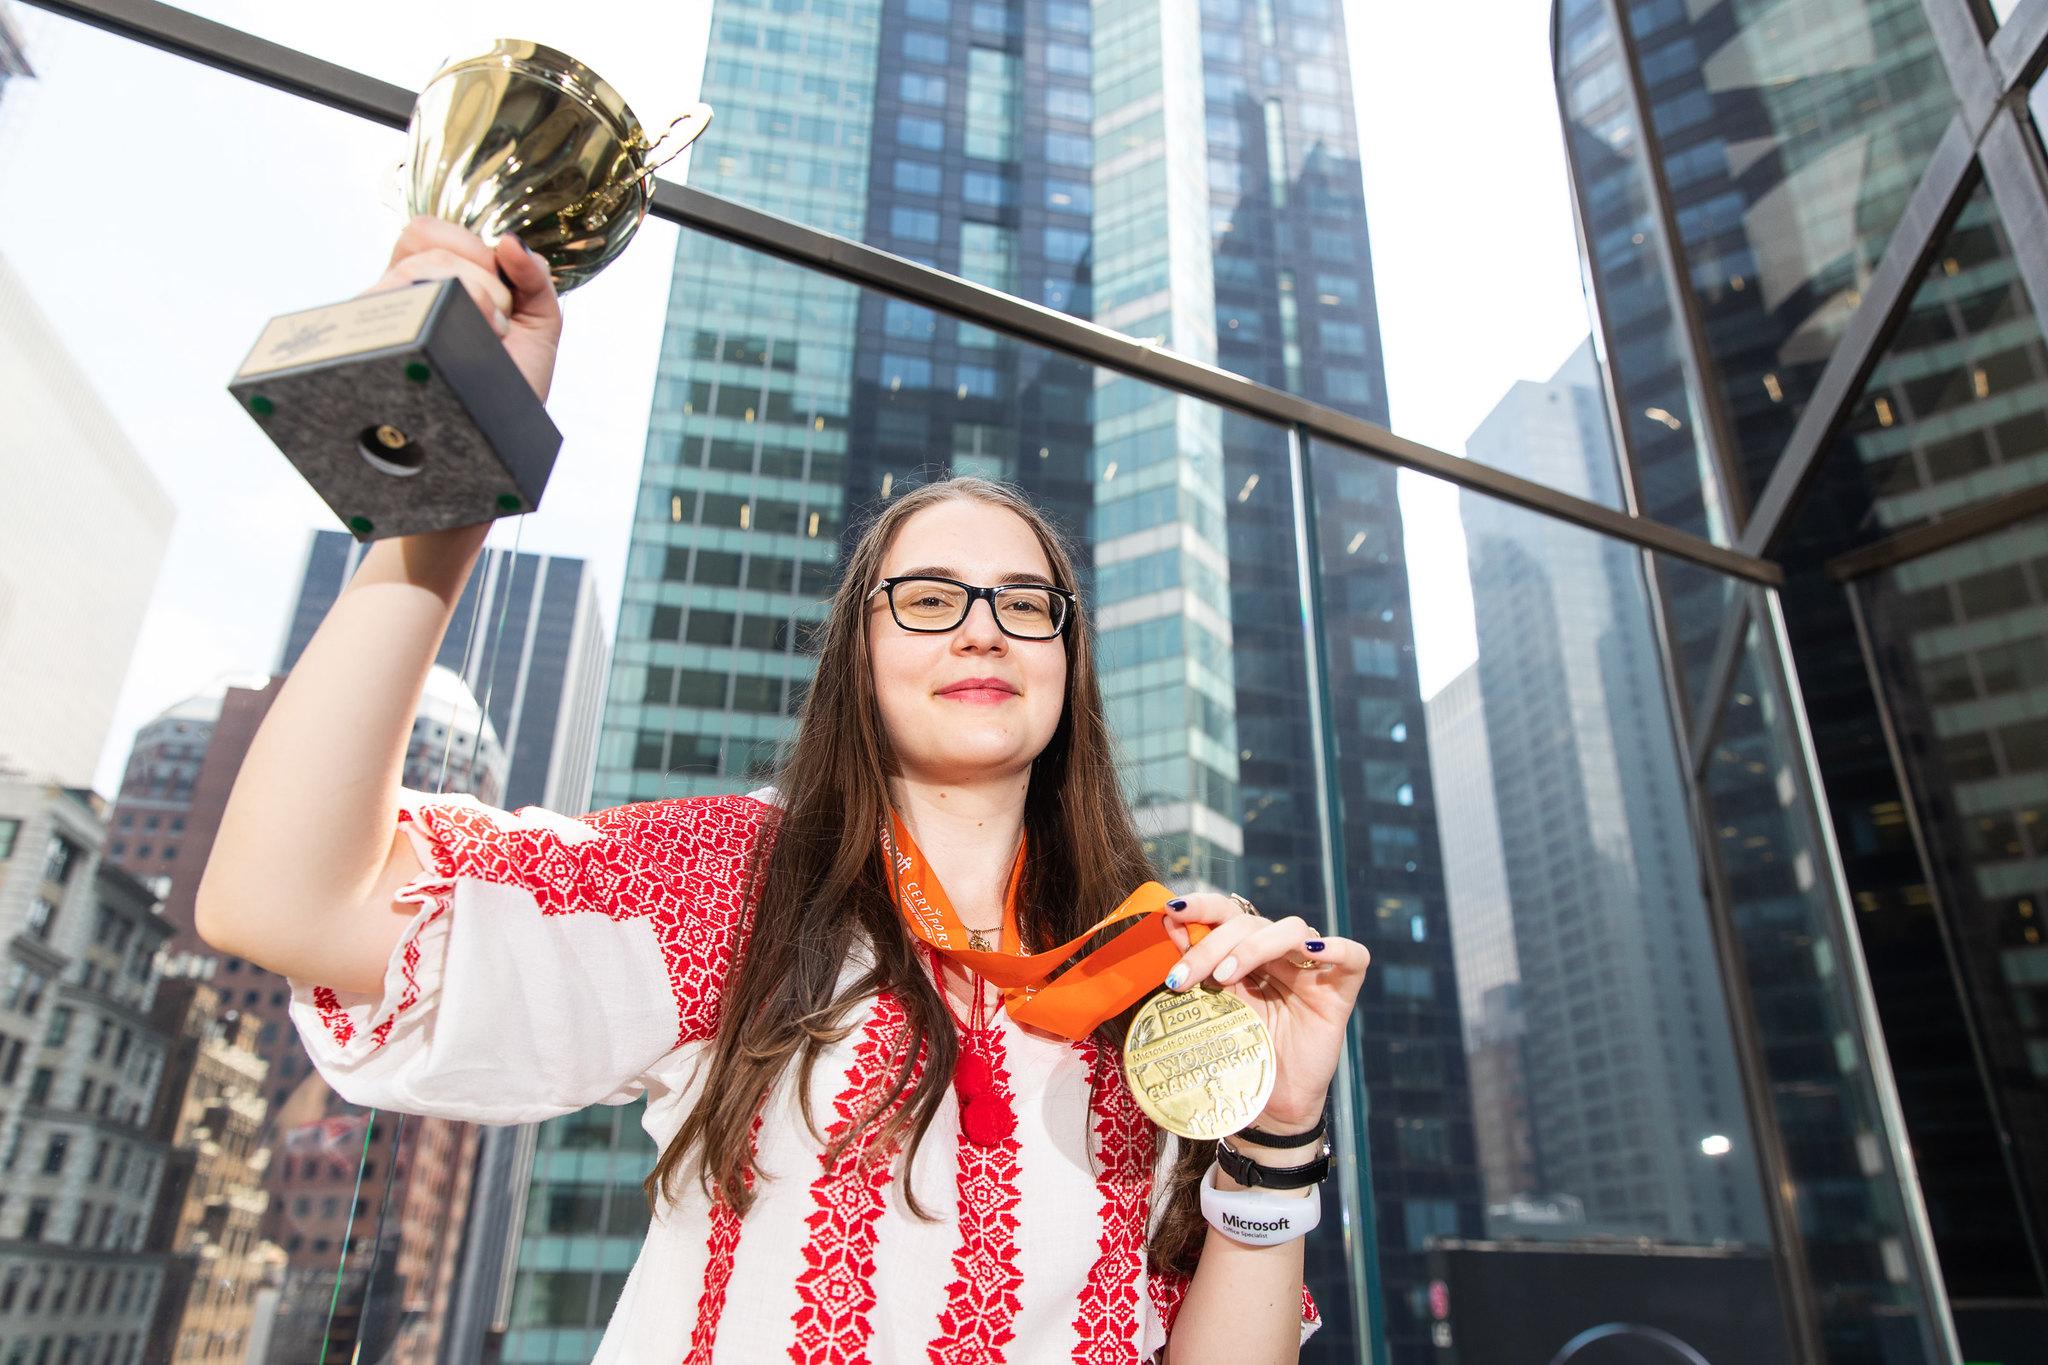 Mihaela Florea Campioana Mondiala Excel2016